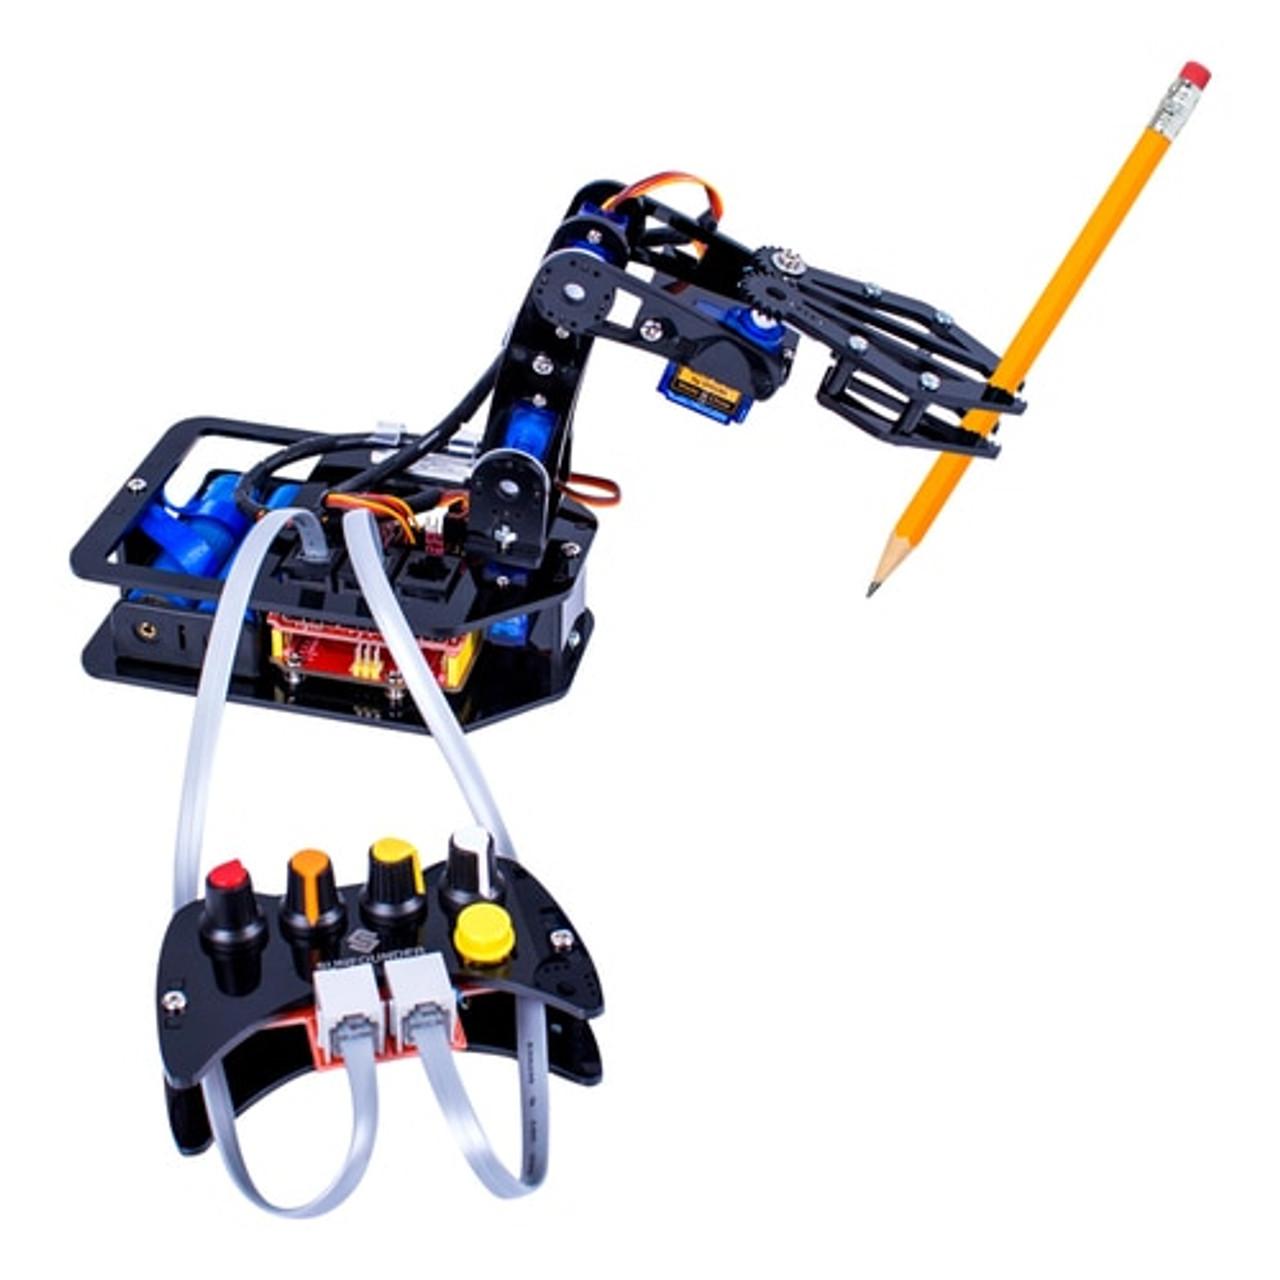 STEAM Robo-Arm Kit for Arduino - Programmable 4-Axis Robot Arm